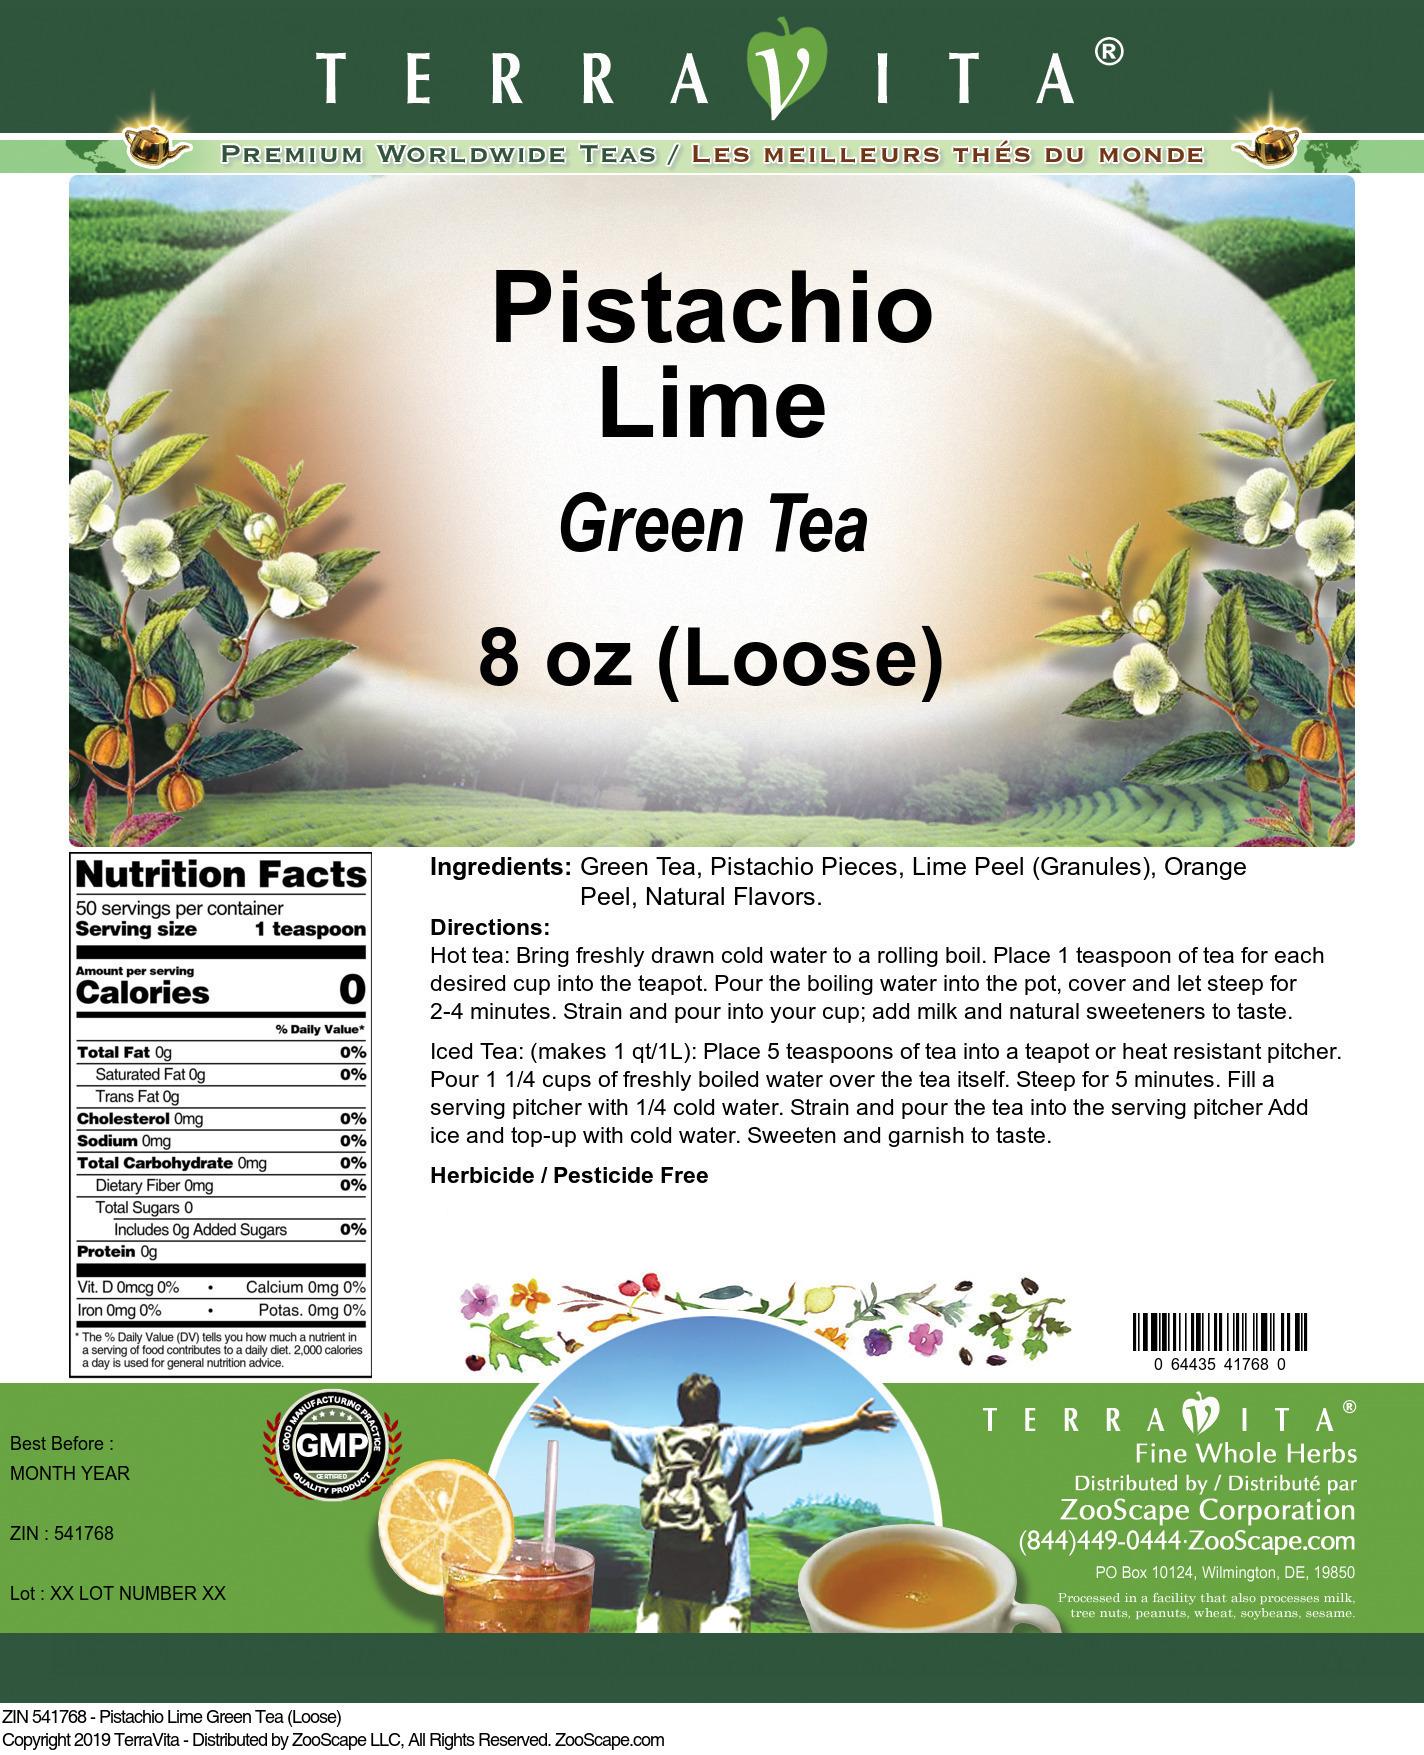 Pistachio Lime Green Tea